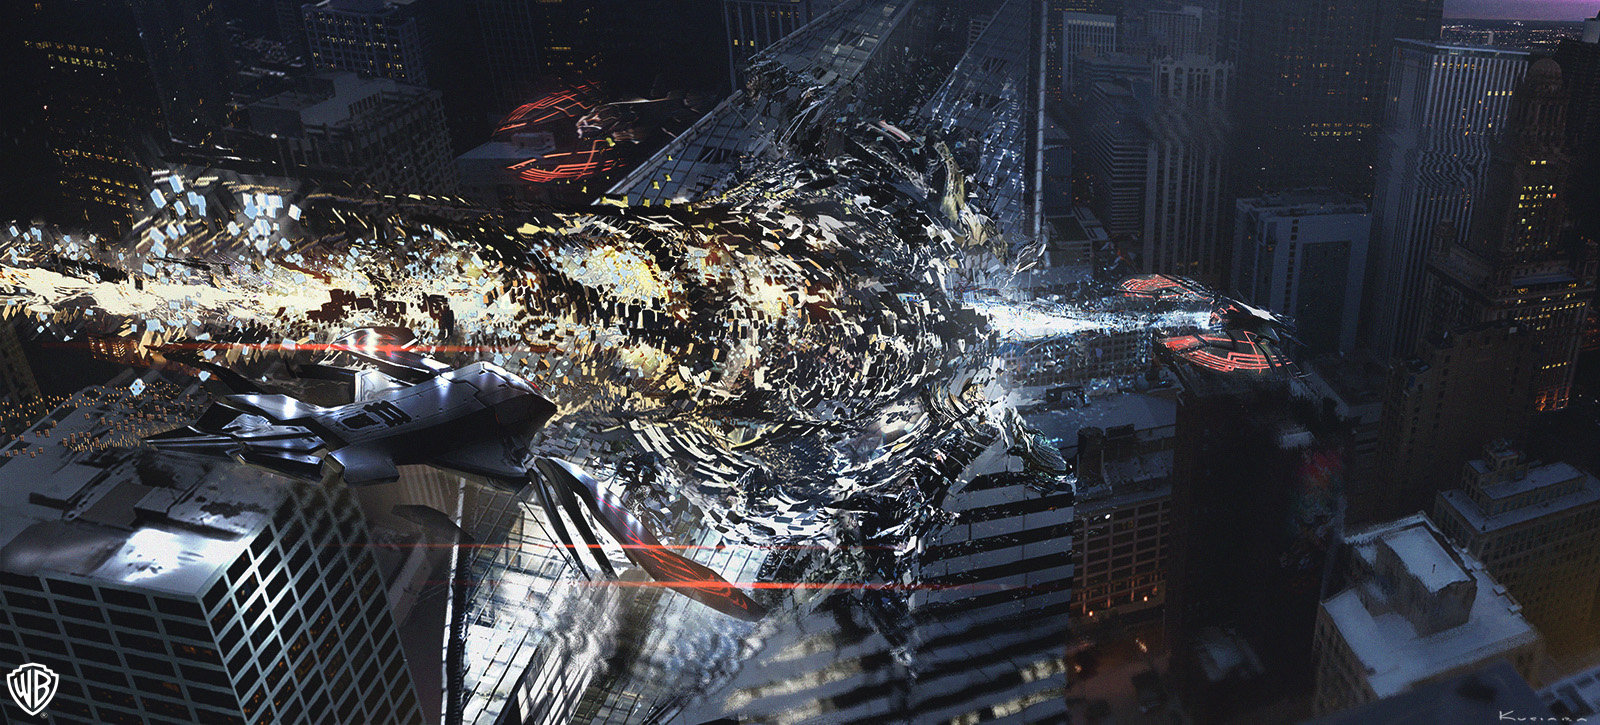 Maciej kuciara env earth wraith chase v21 130126